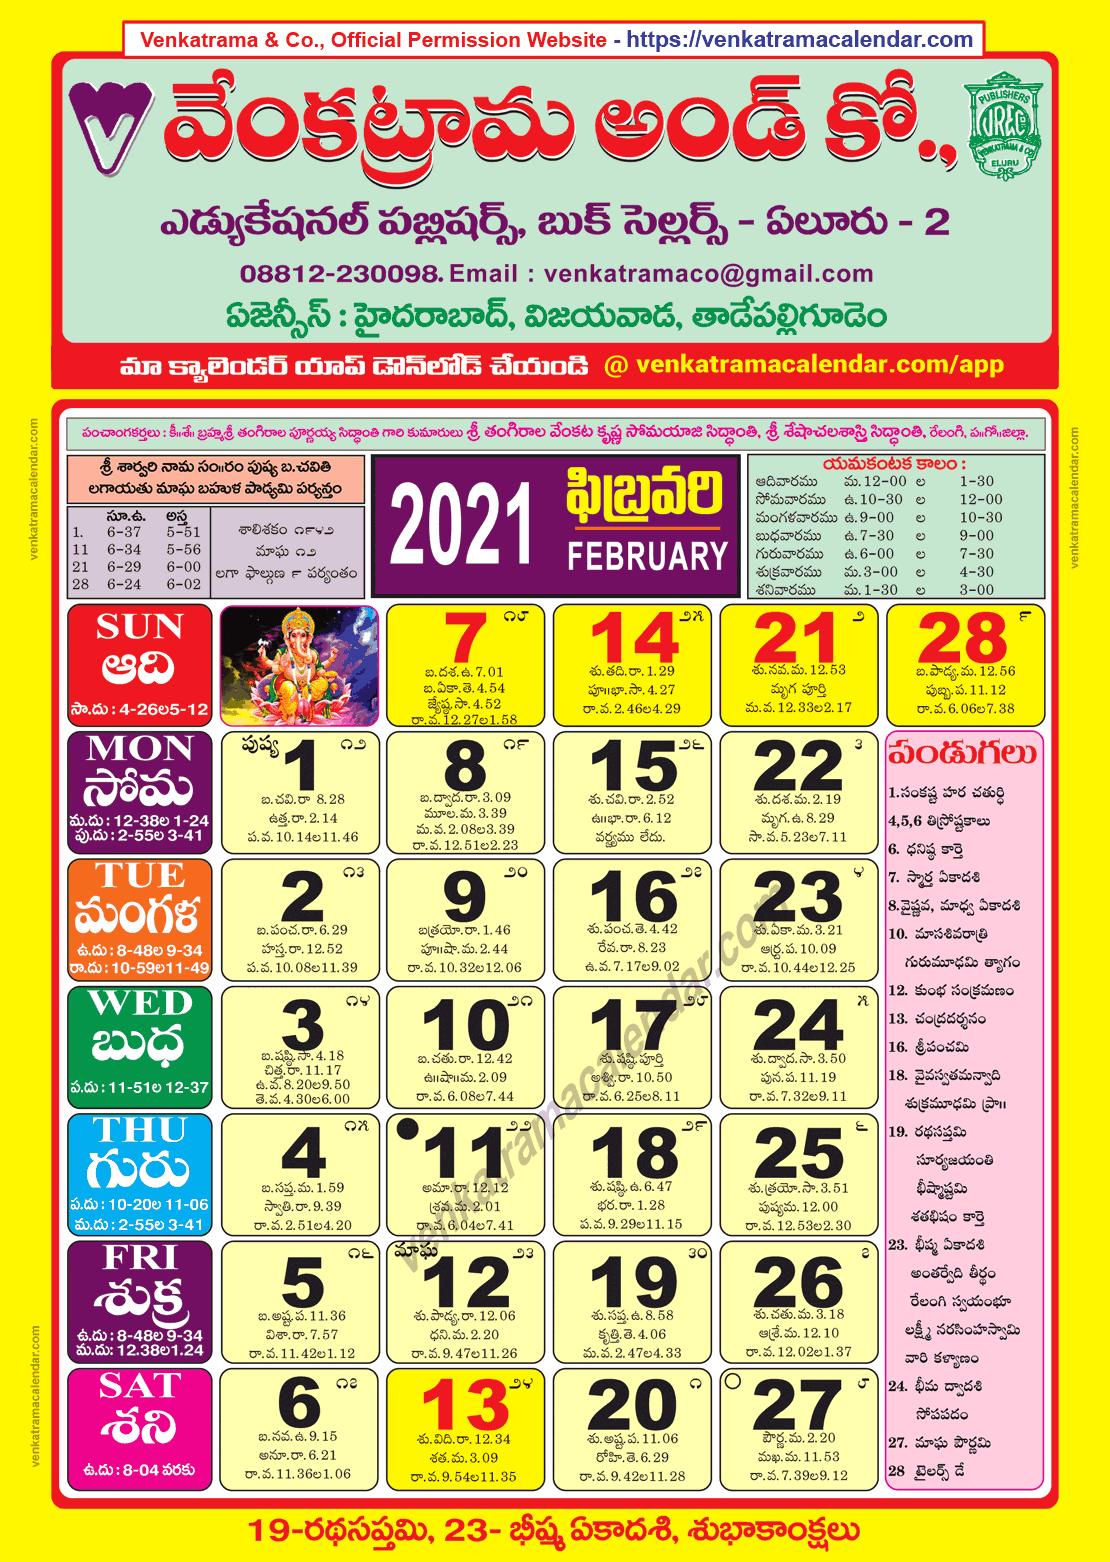 Telugu Calendar 2022 February.Venkatrama Co 2021 February Telugu Calendar Colour